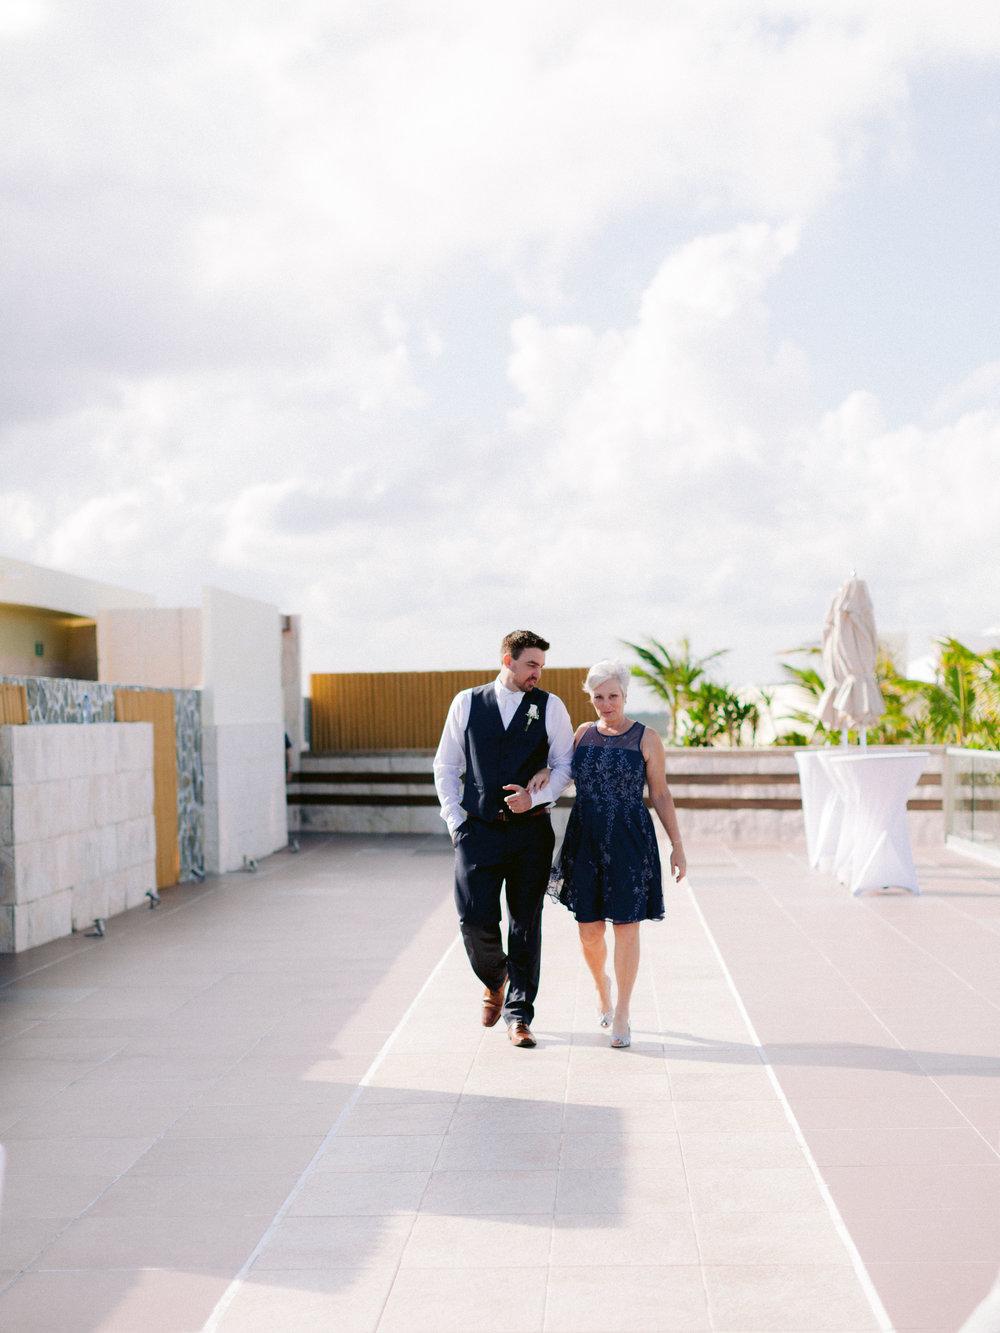 Kim_Jeff_Cancun Wedding_Ceremony_Kurtz_Orpia (32 of 119).jpg